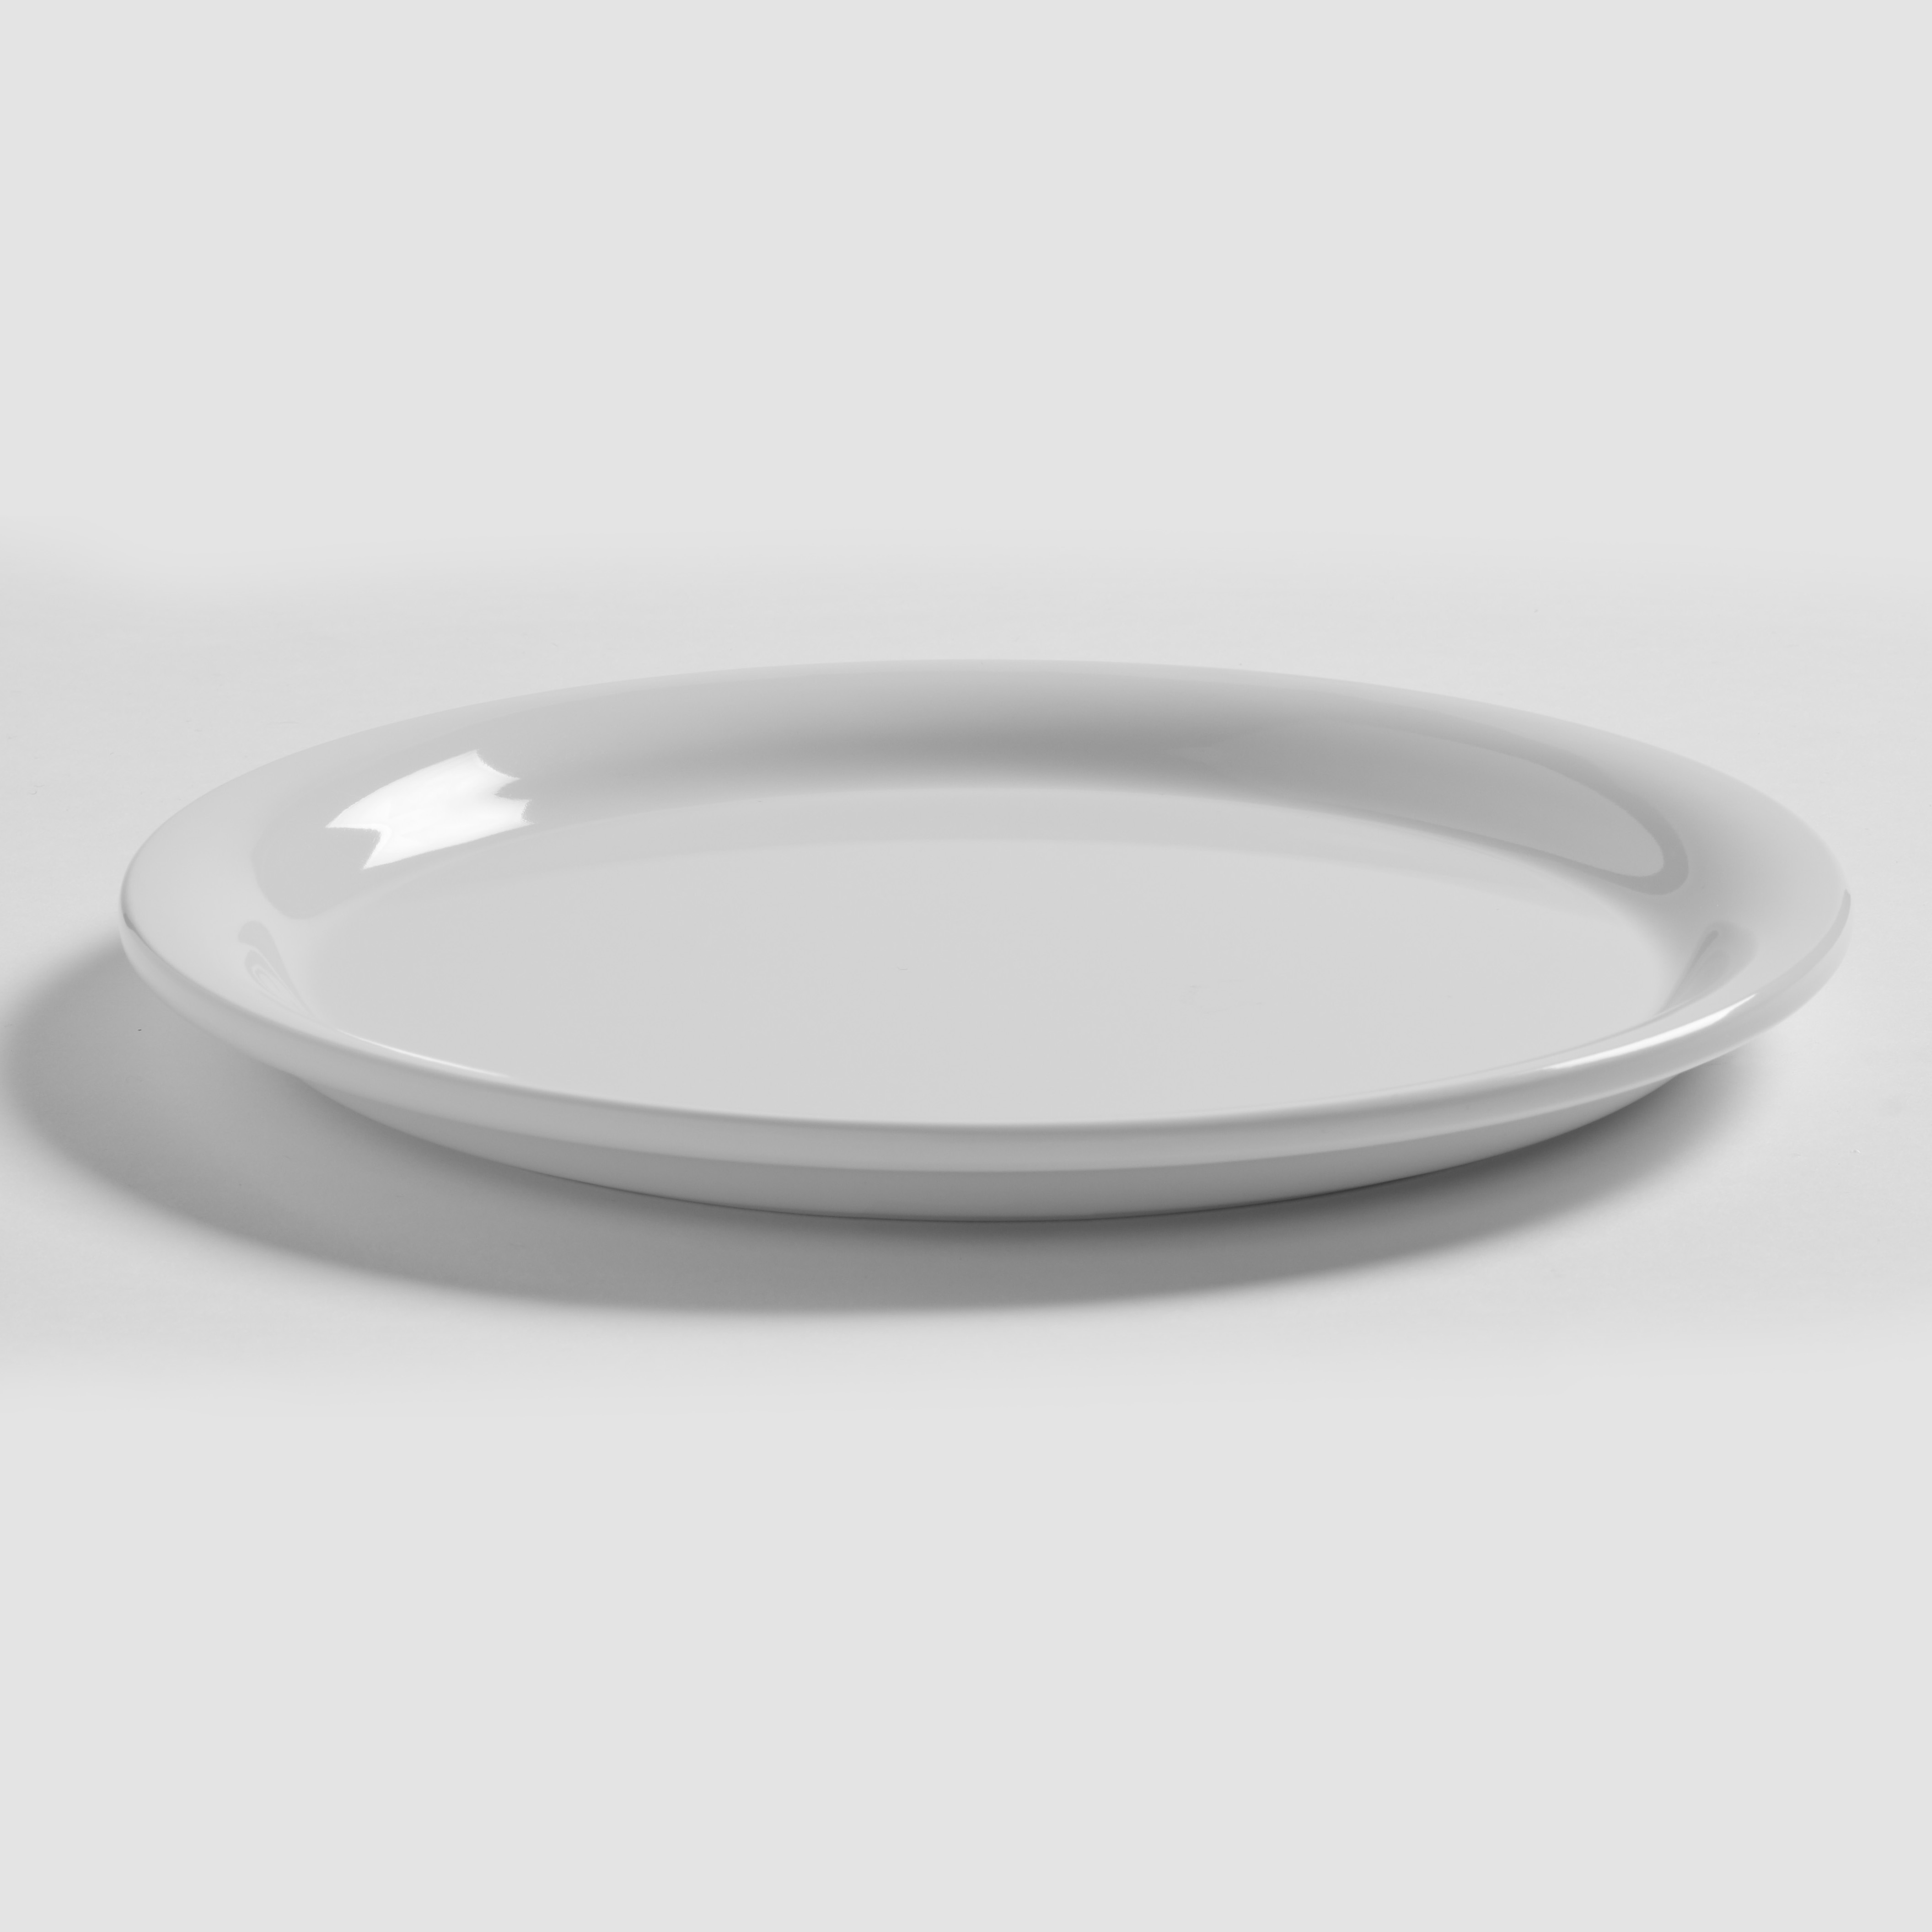 American Metalcraft DPN7WH plate, plastic